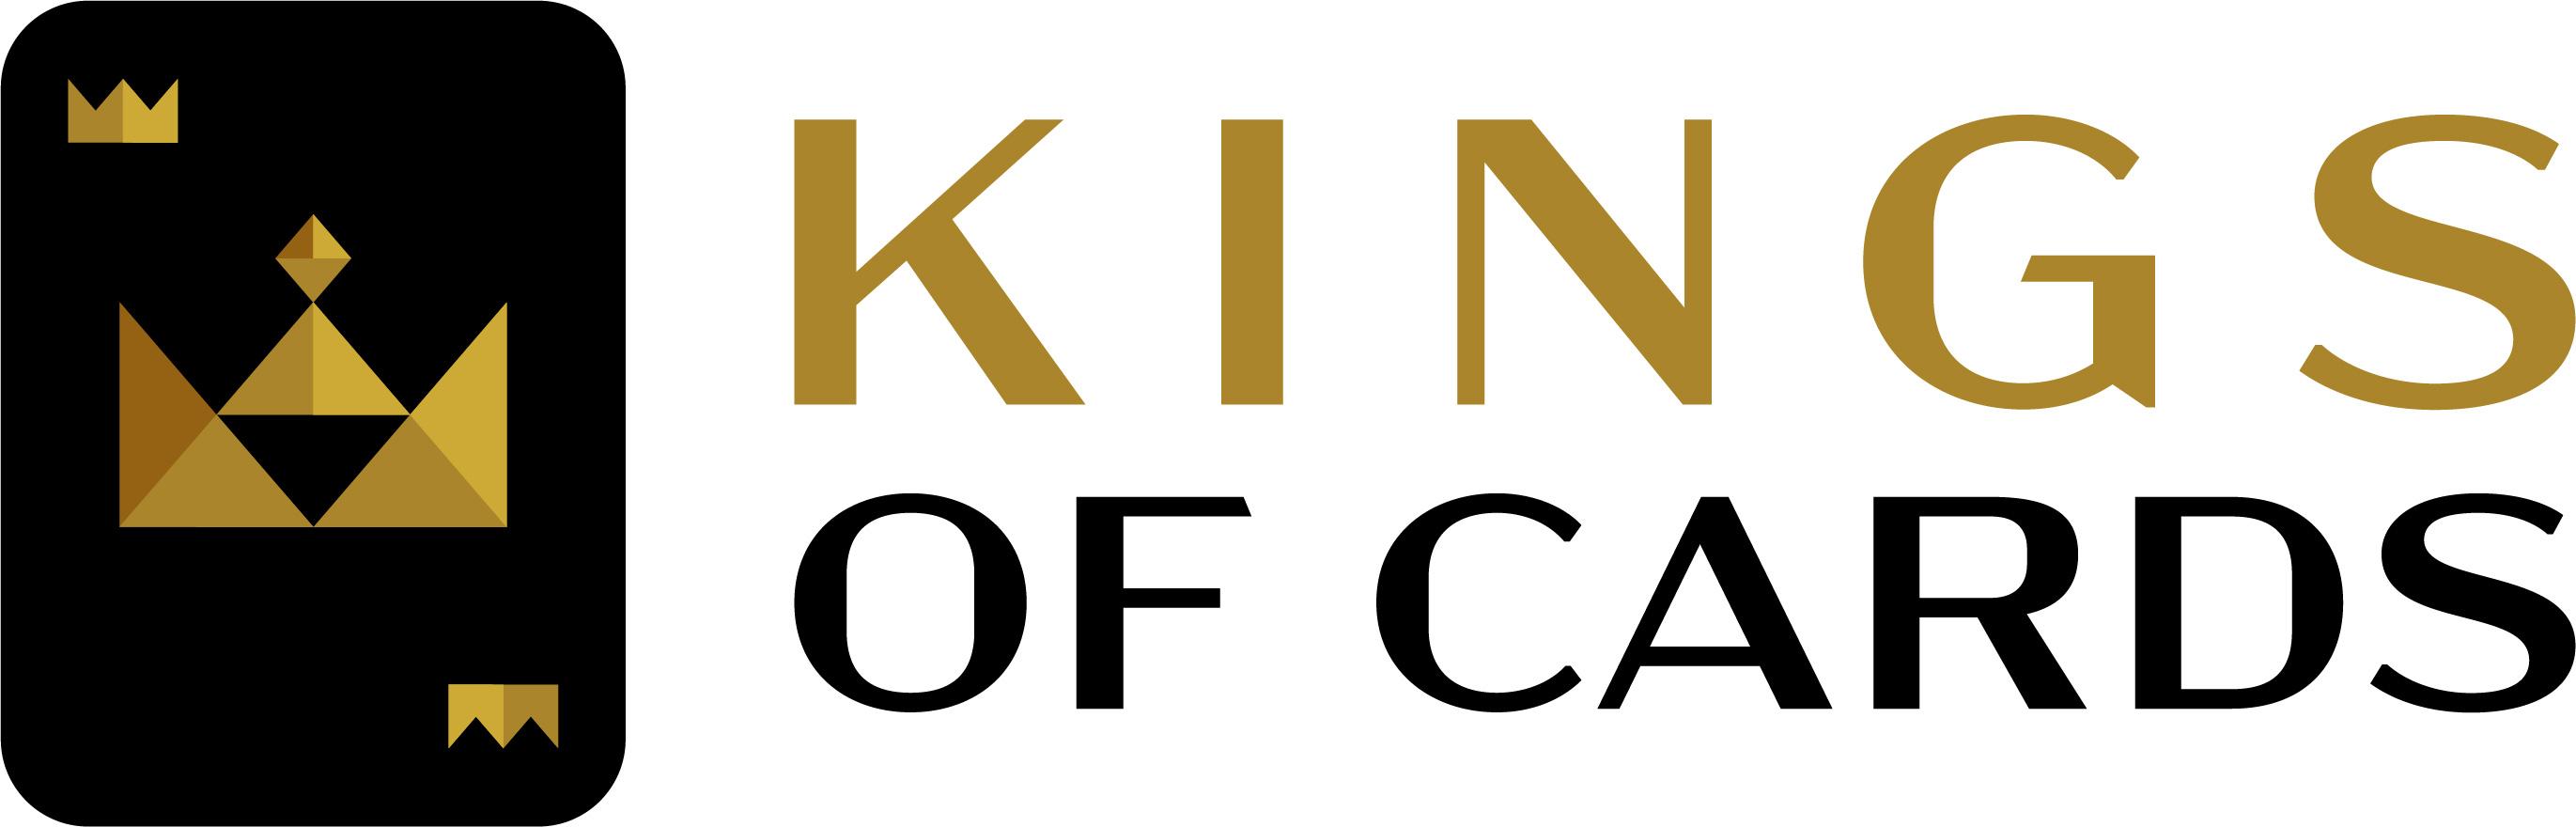 Wort-/Bildmarke: KINGS OF CARDS